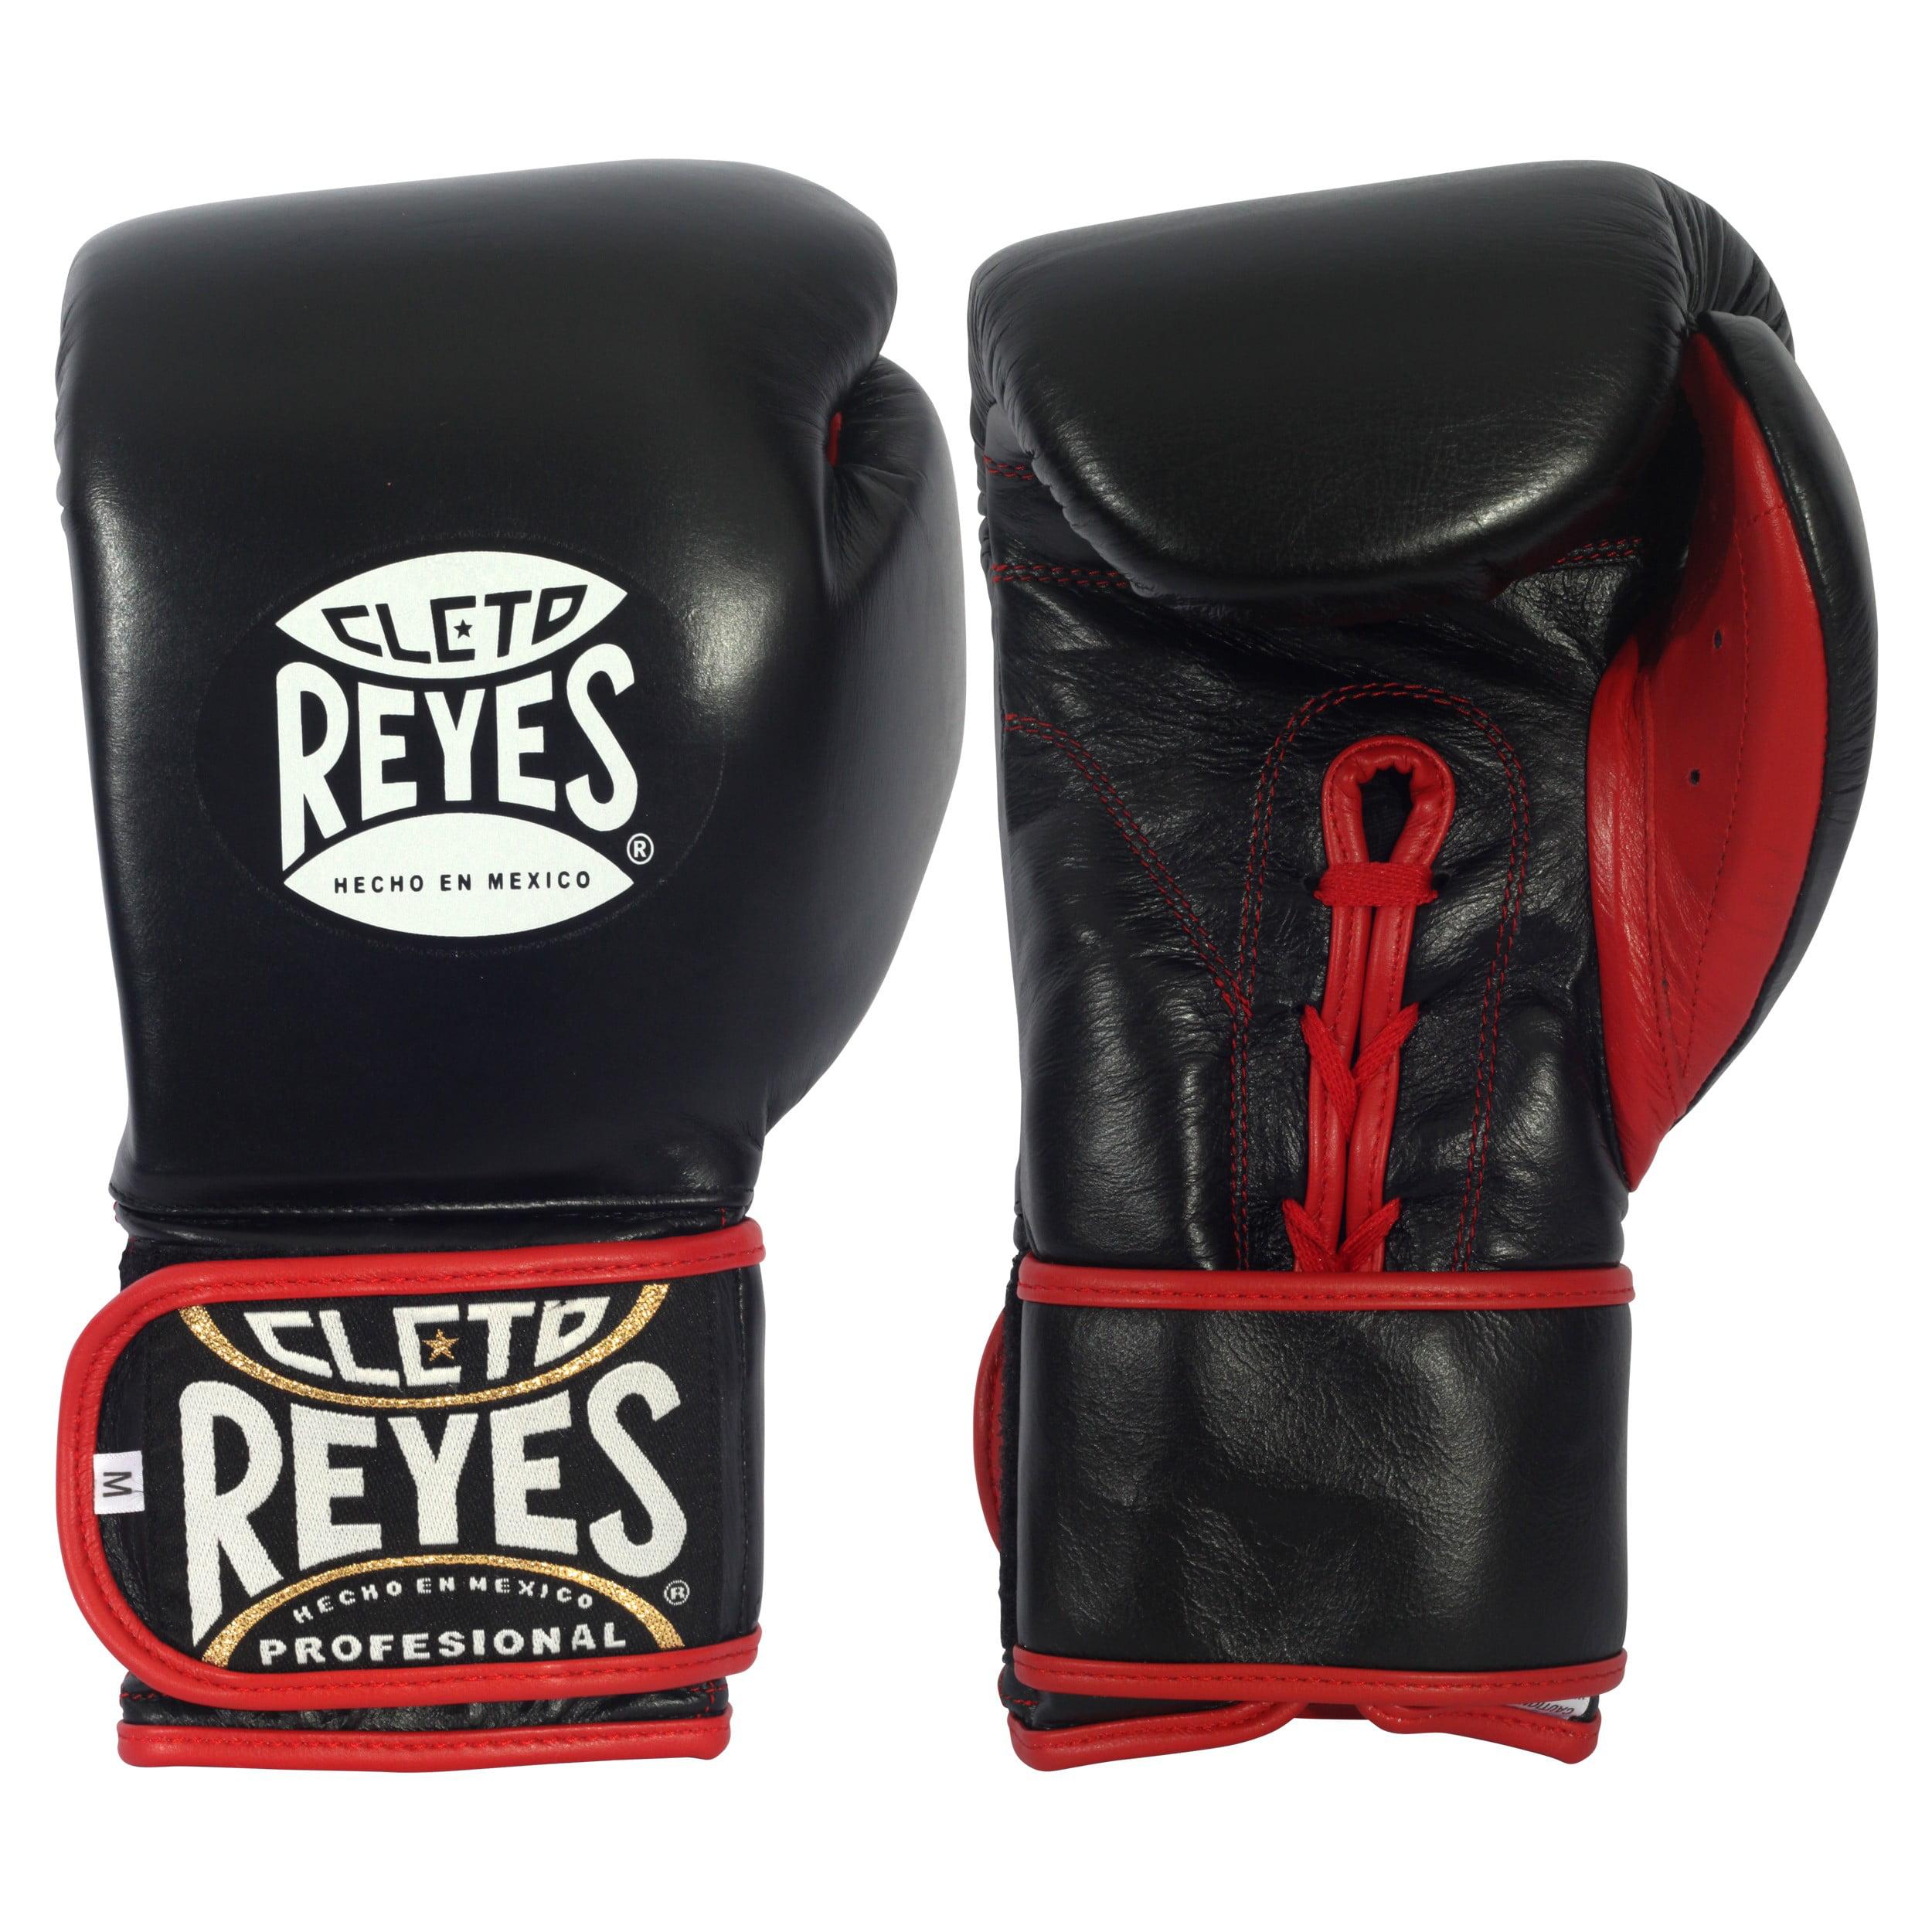 Cleto Reyes Hybrid Lace Hook and Loop Training Gloves